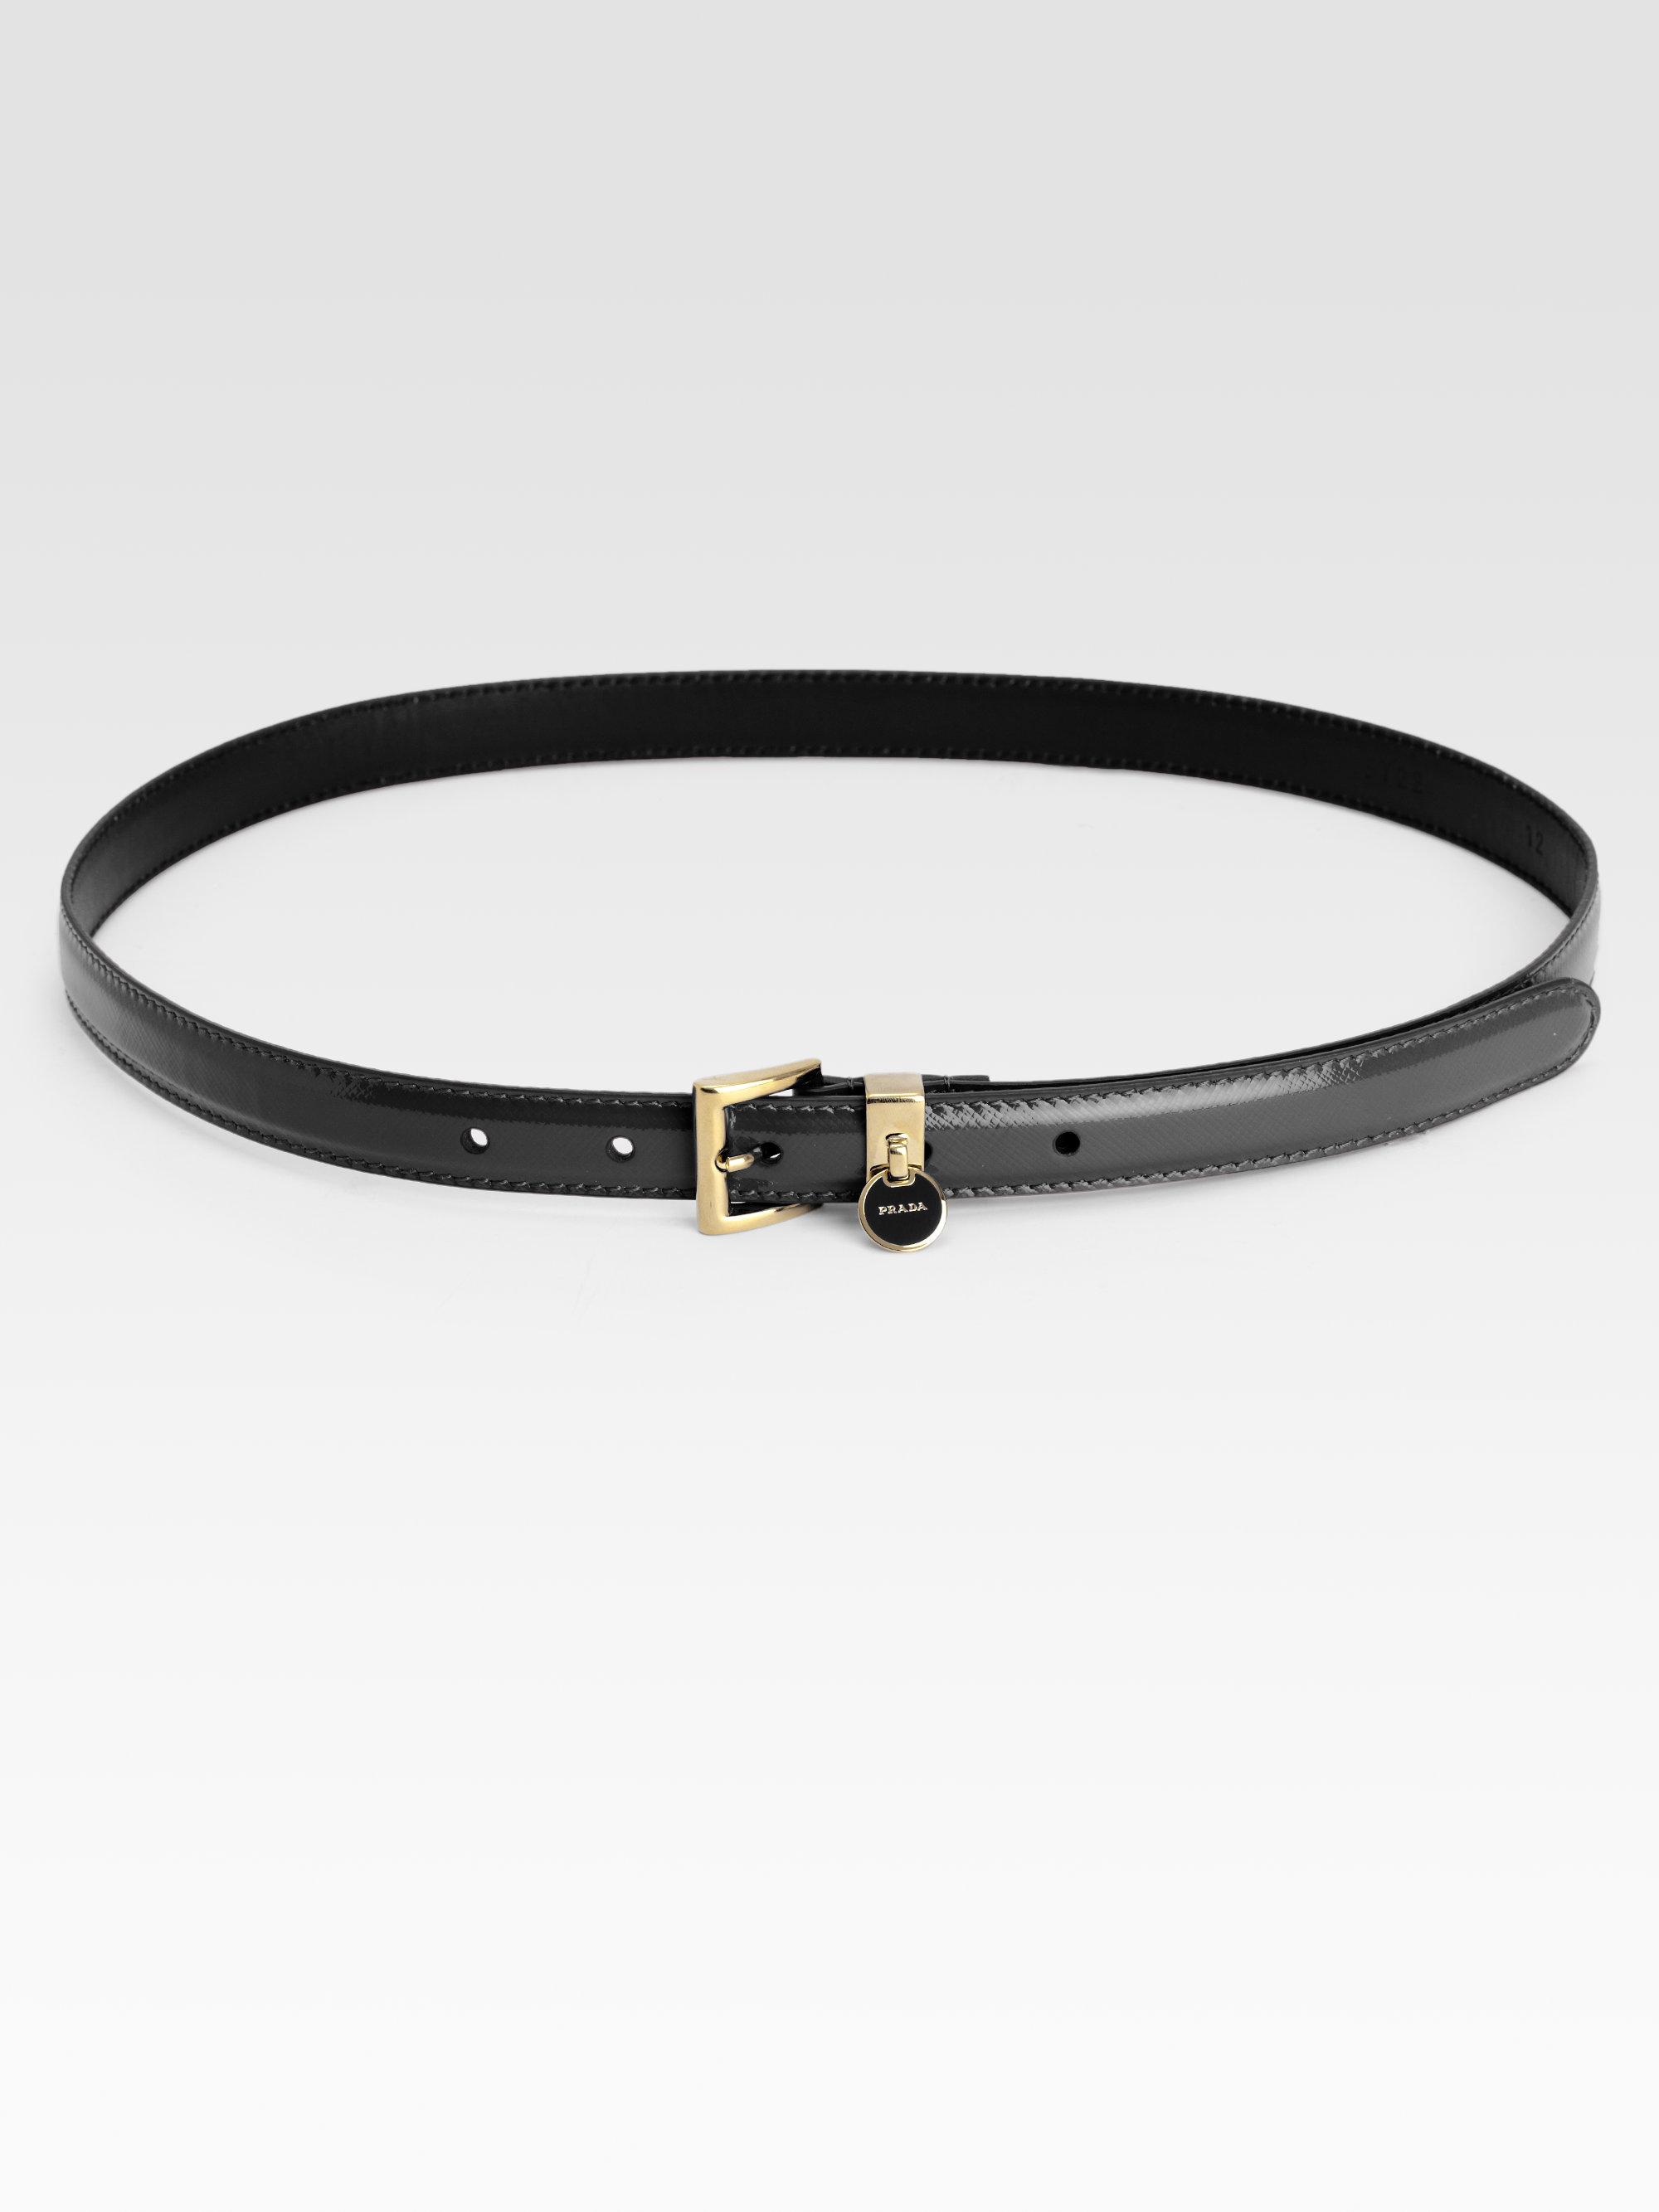 Prada Belts | Lyst?